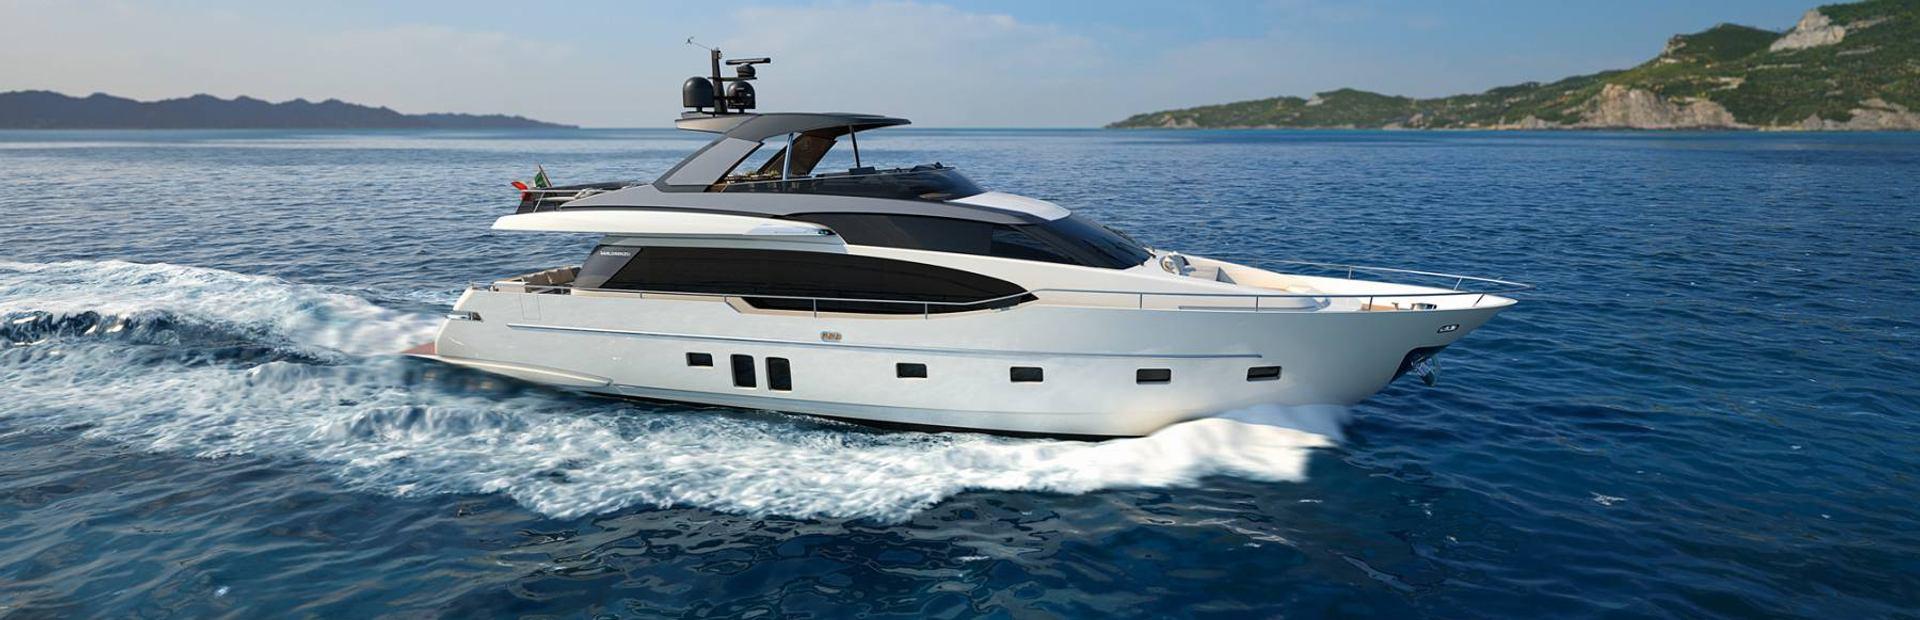 SL78 Yacht Charter